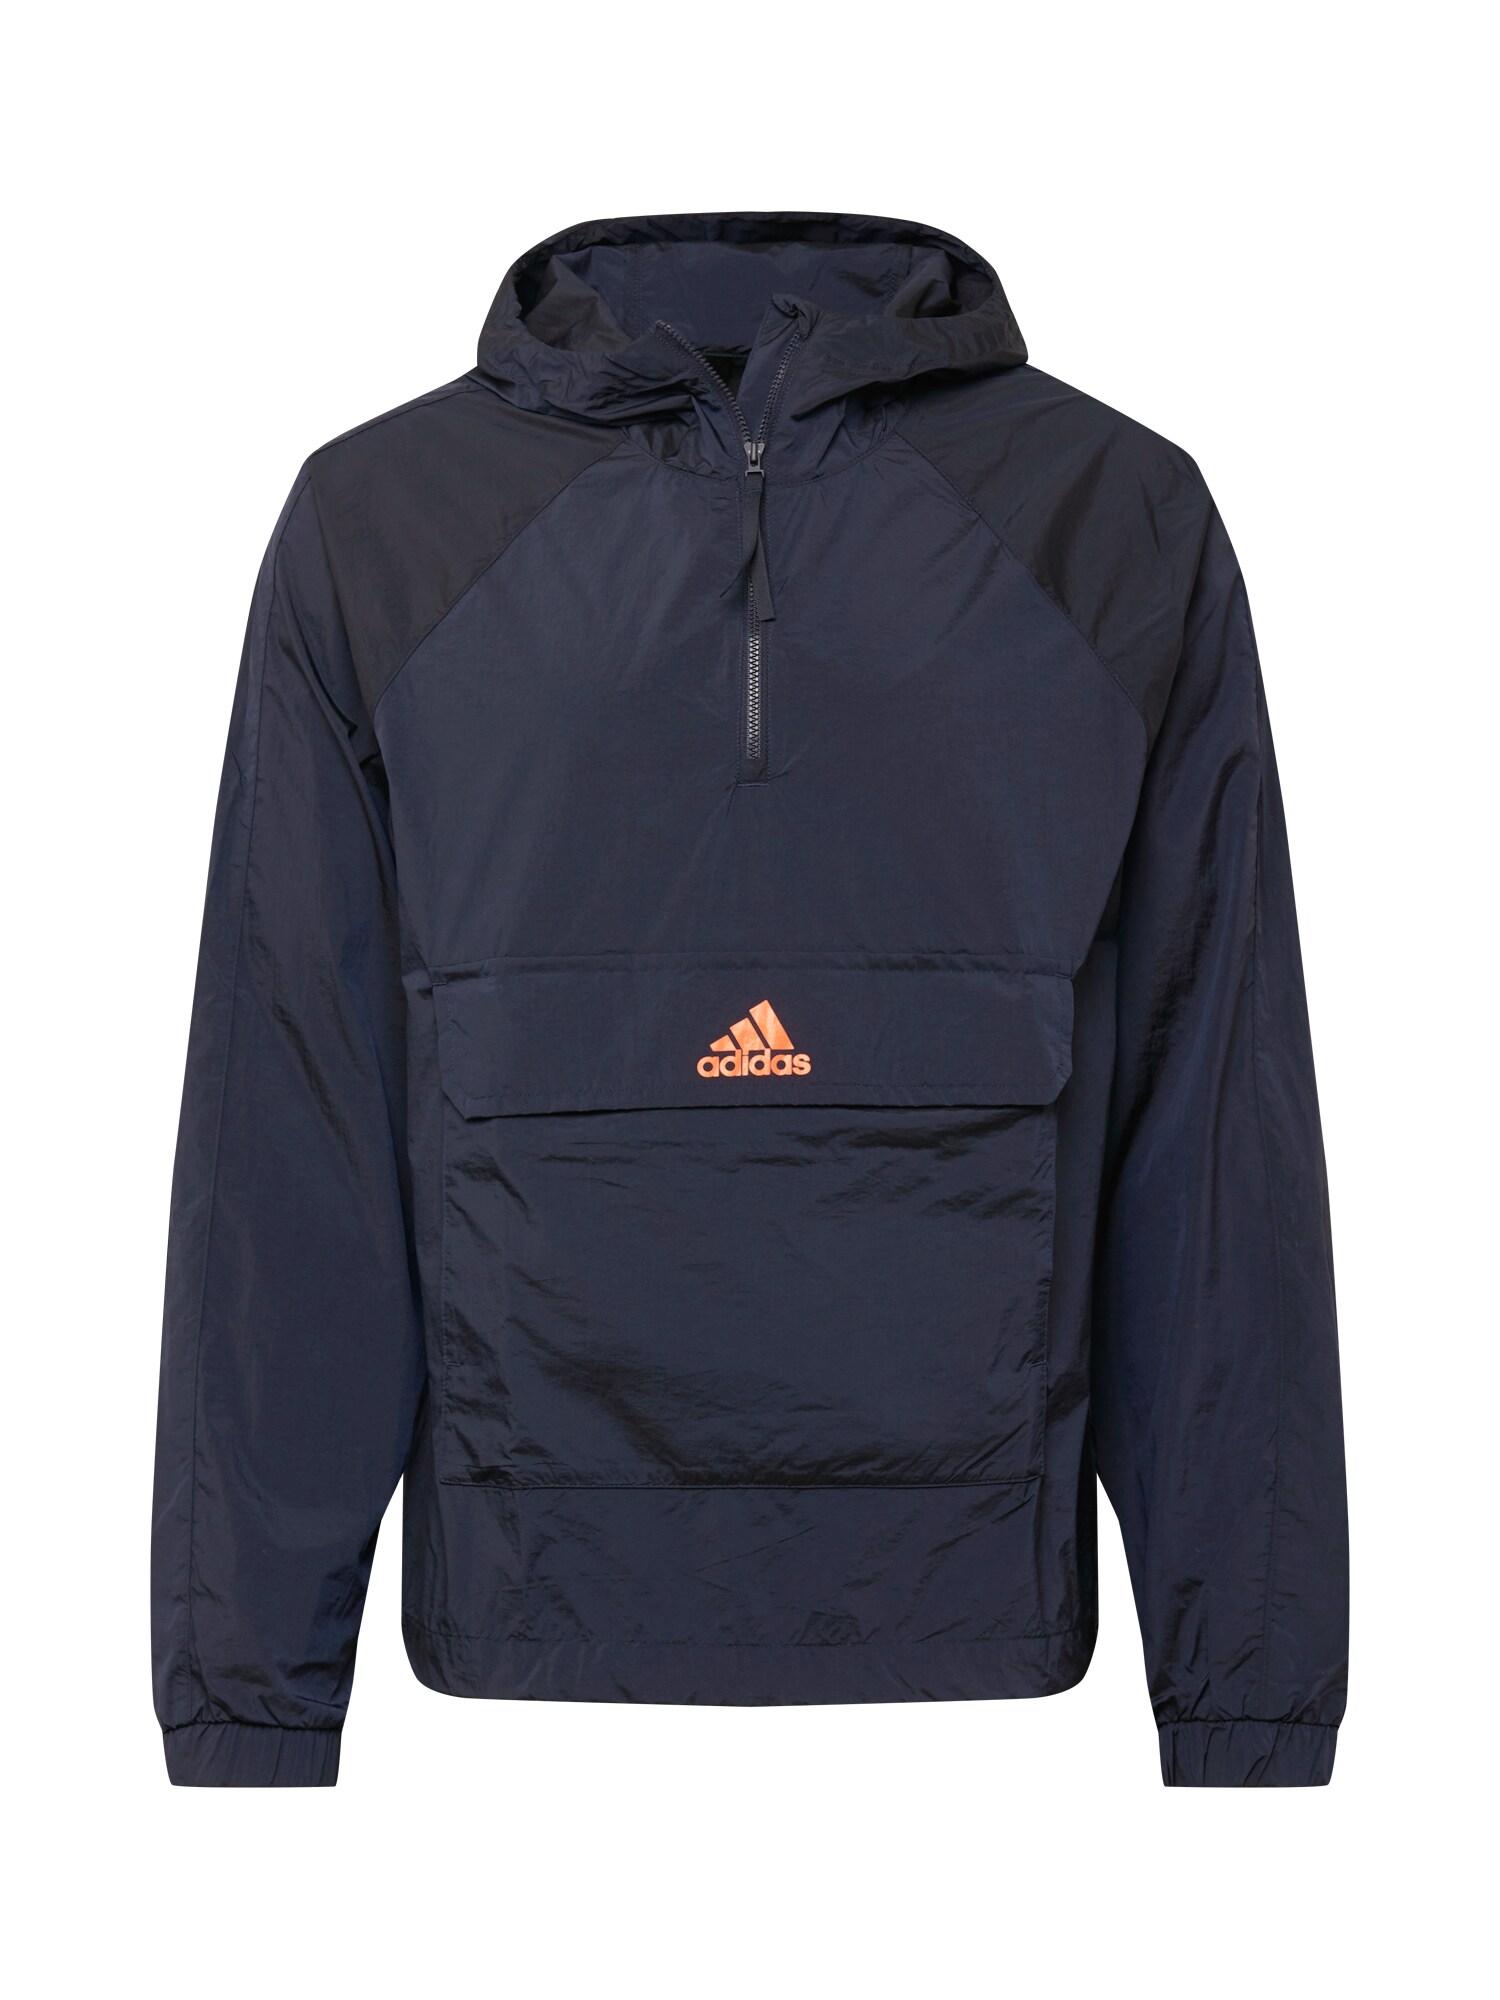 ADIDAS PERFORMANCE Sportovní bunda  oranžová / marine modrá